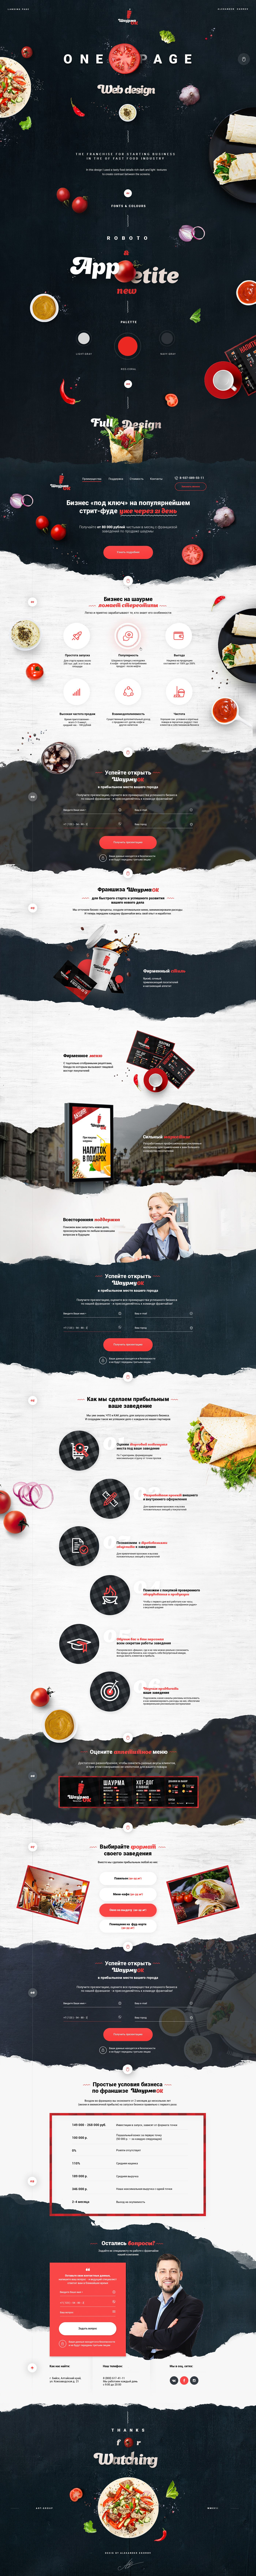 Echa Un Vistazo A Este Proyecto Behance Onepage Design Fast Food Shavermaok Https Www Behance Net Gall Franchise Food Fast Food Franchise Food Web Design